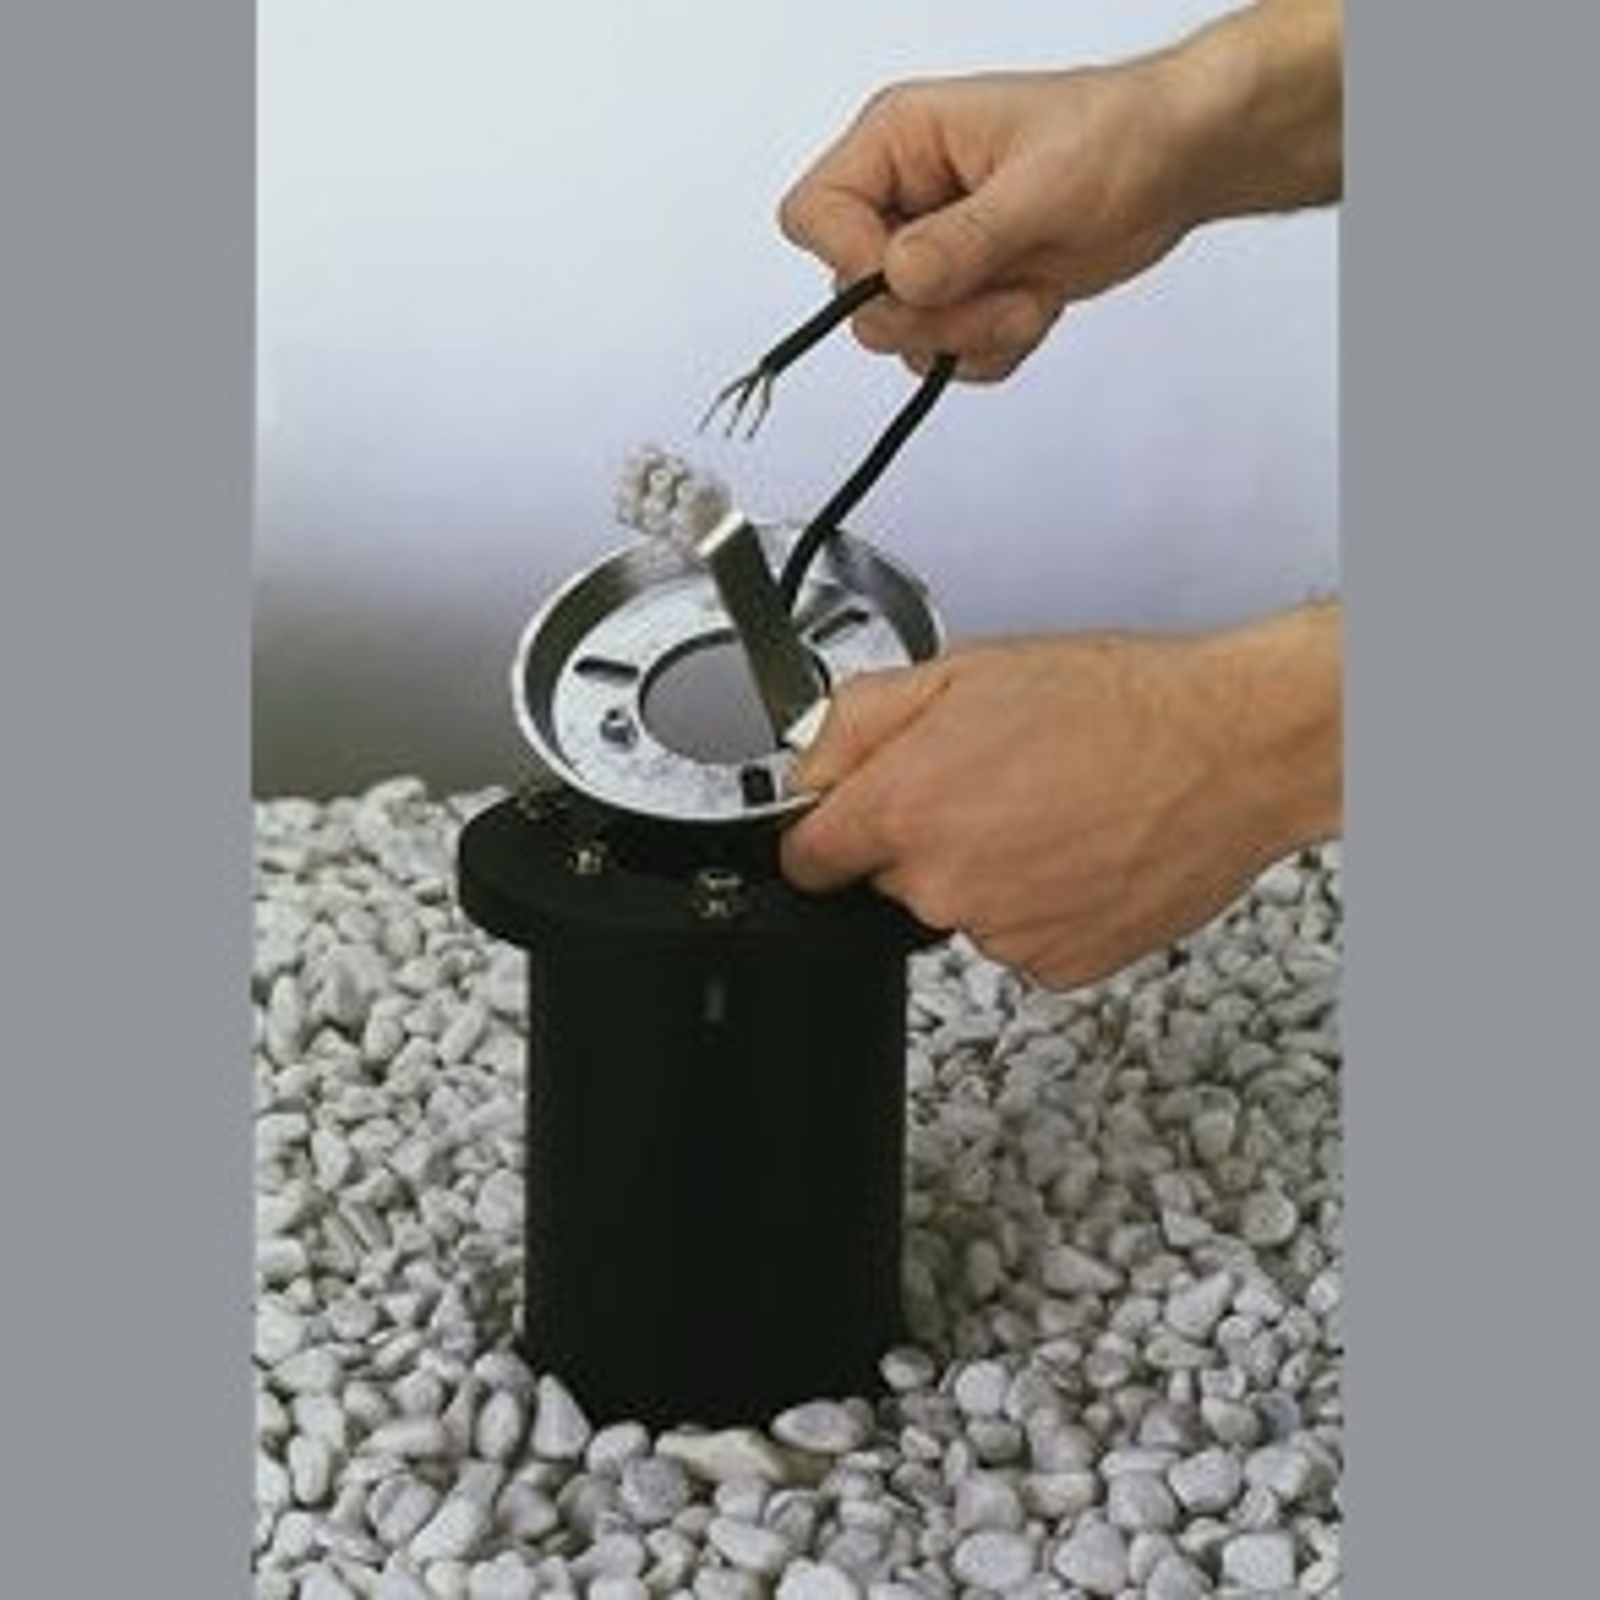 Erdeinbausockel aus Aluminiumguss Einbautiefe 40cm